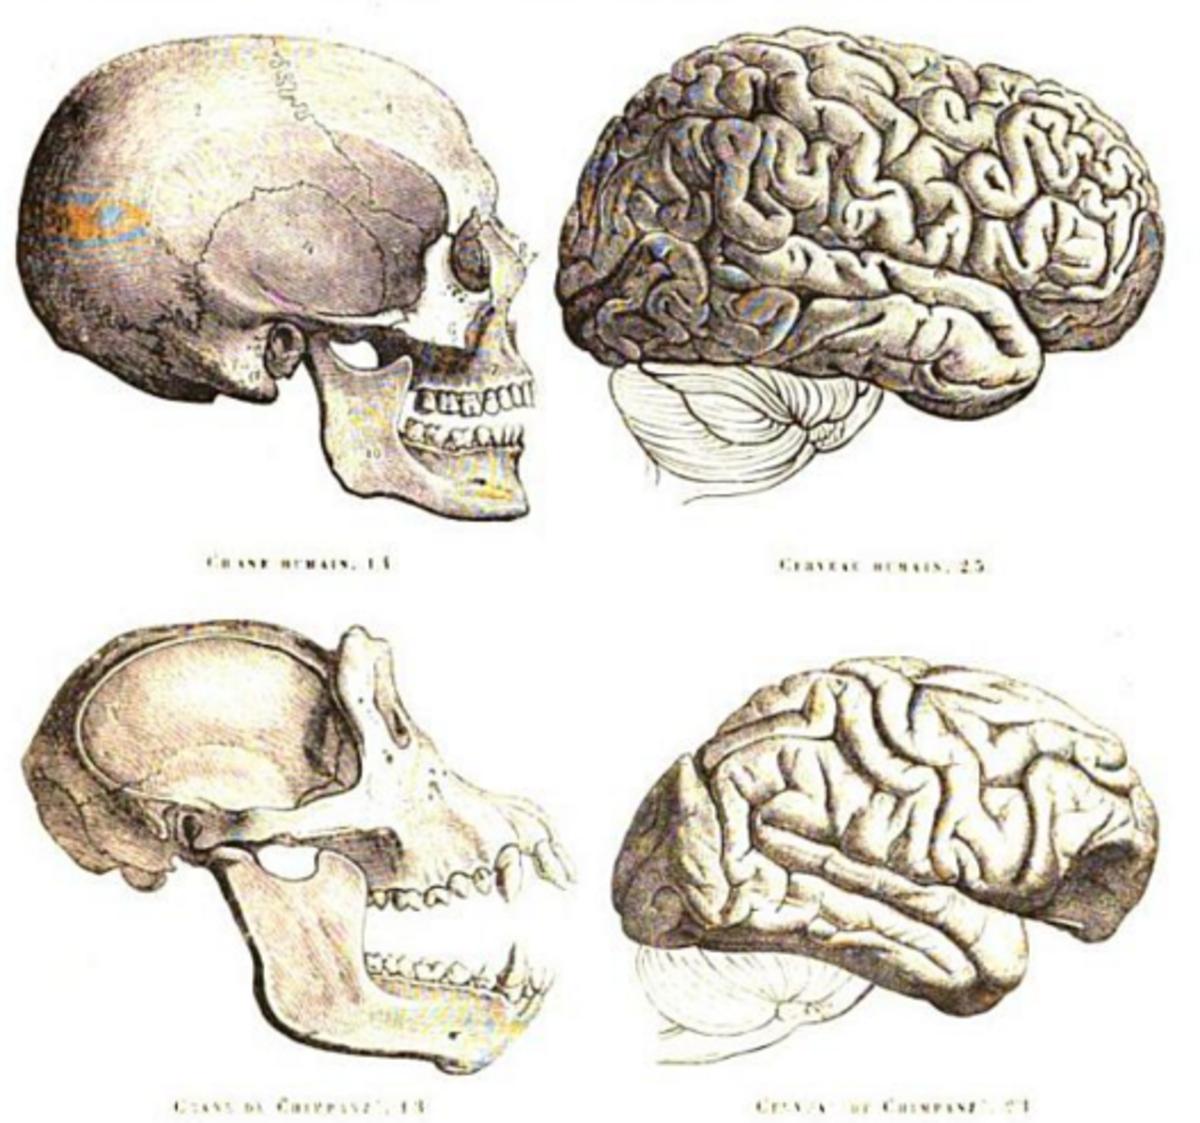 Humans versus chimp  skull